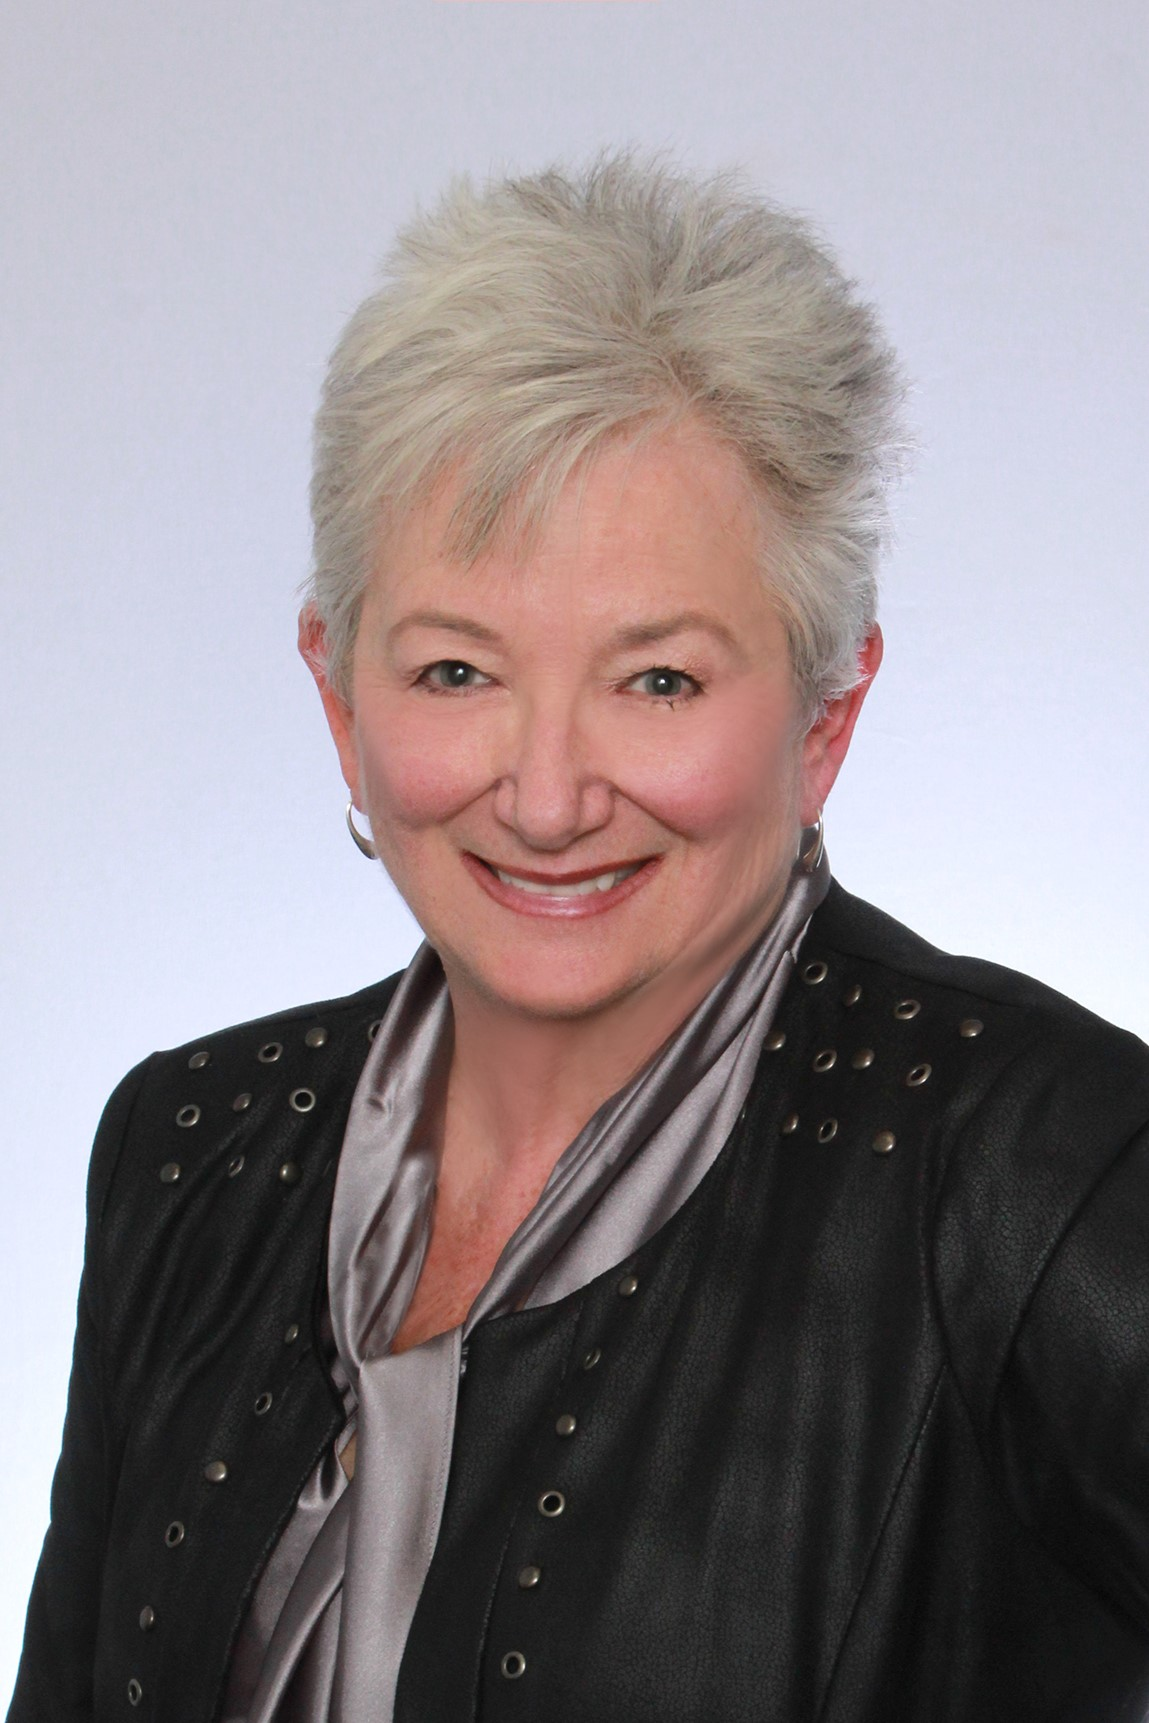 Teresa Easterday